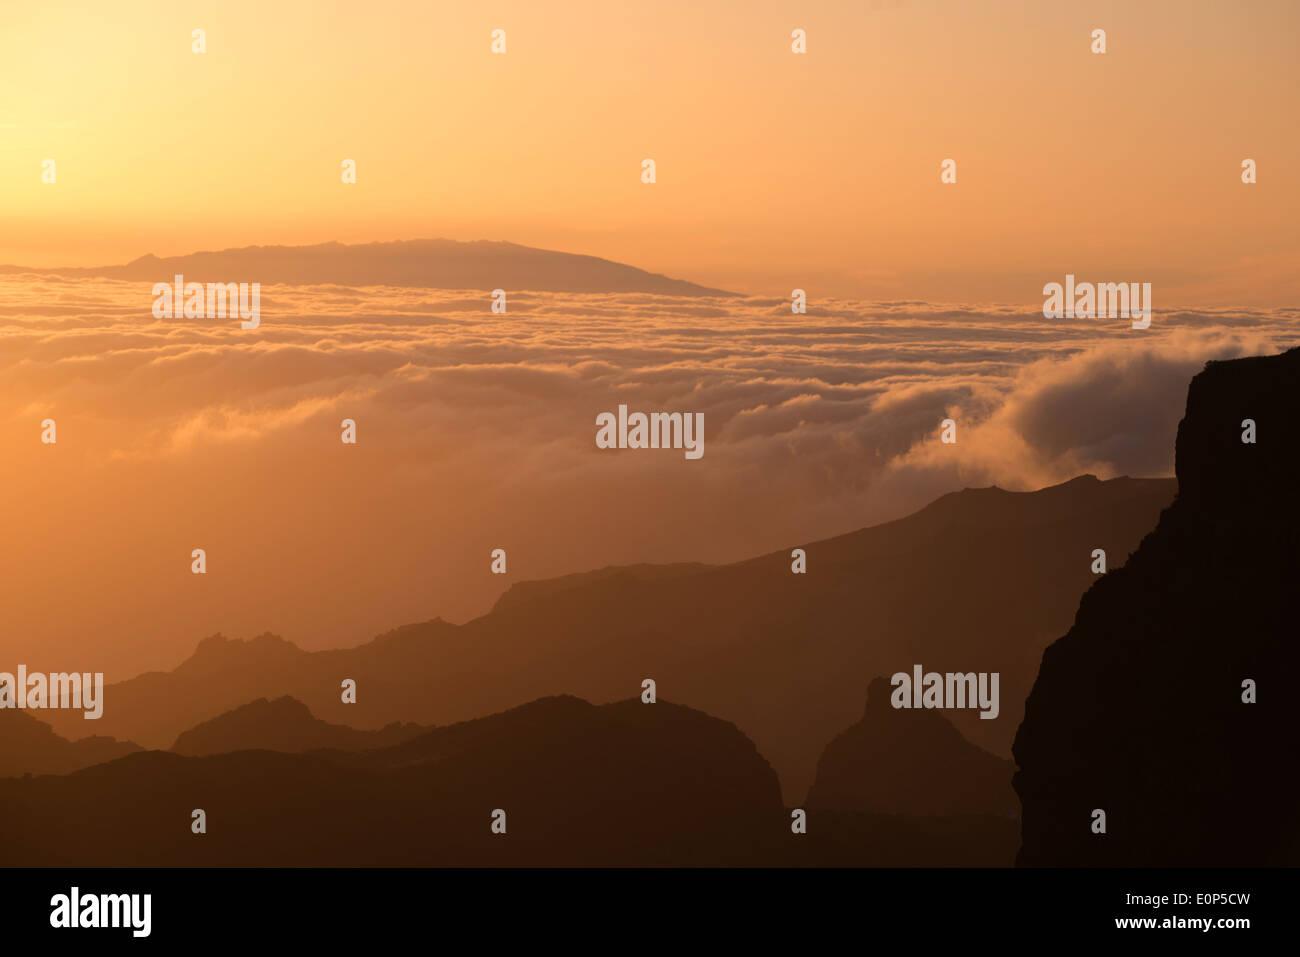 Mirador Degollada de Cherfe Blick über Teno-Gebirge mit Insel La Palma während Sonnenuntergang Teneriffa Kanaren Stockbild